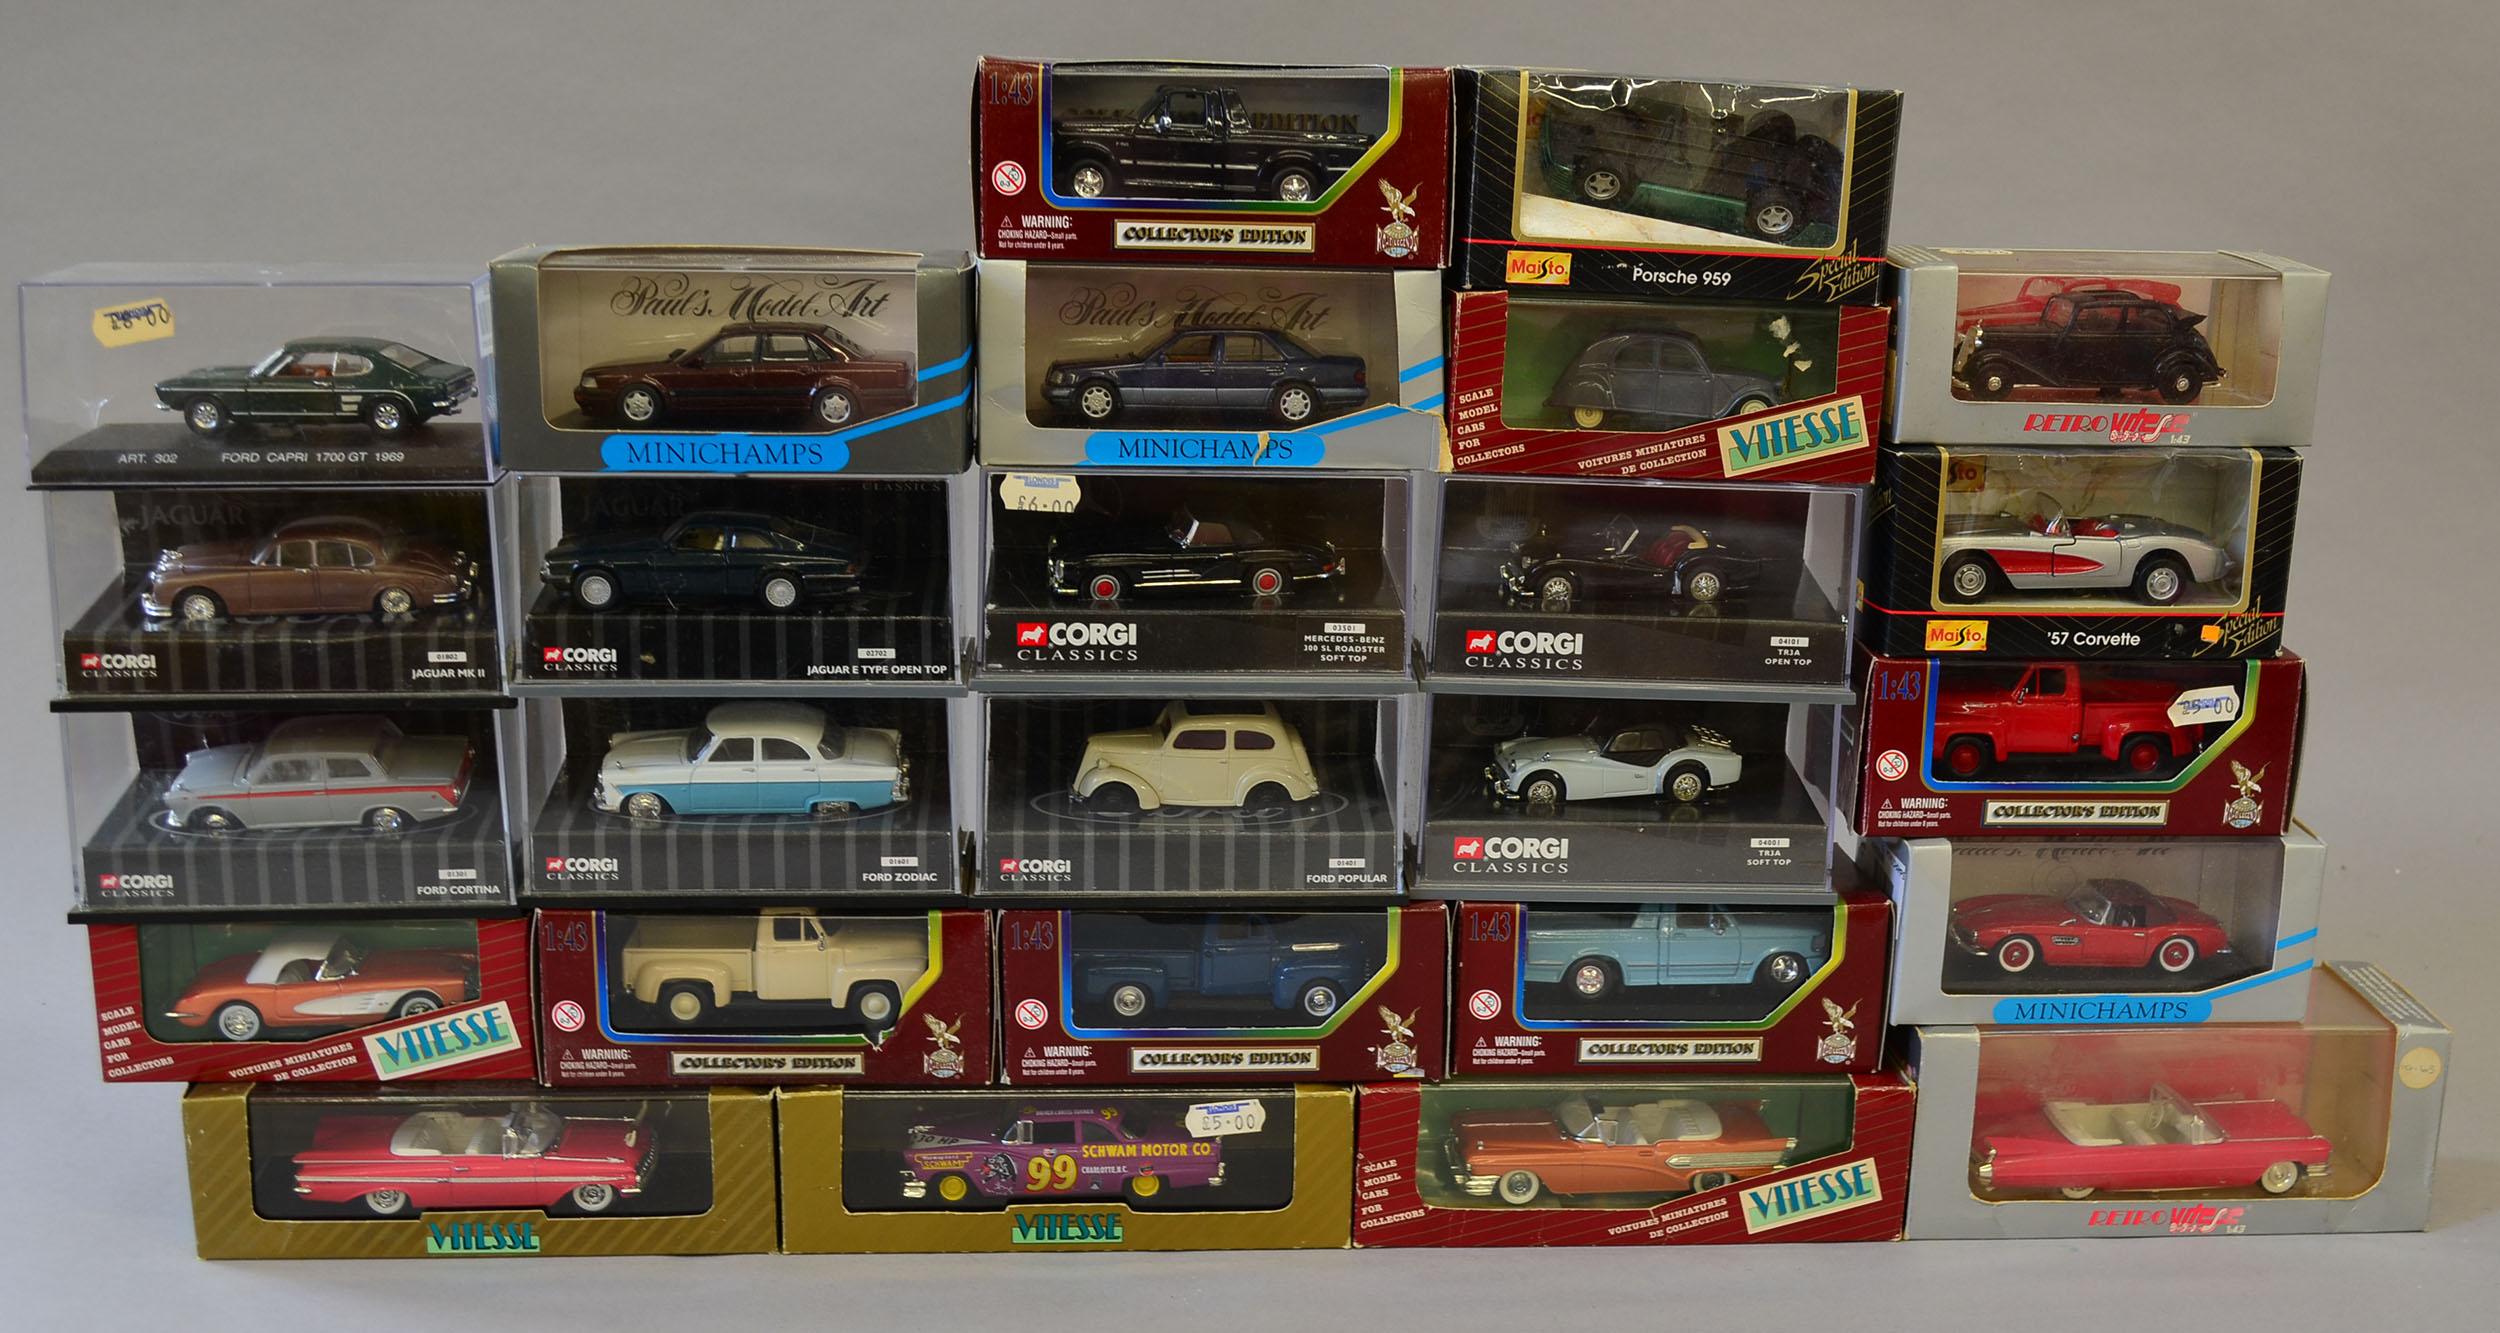 27 x assorted 1:43 scale diecast model cars, includes Corgi, Vitesse, Road Legends, Maisto and o